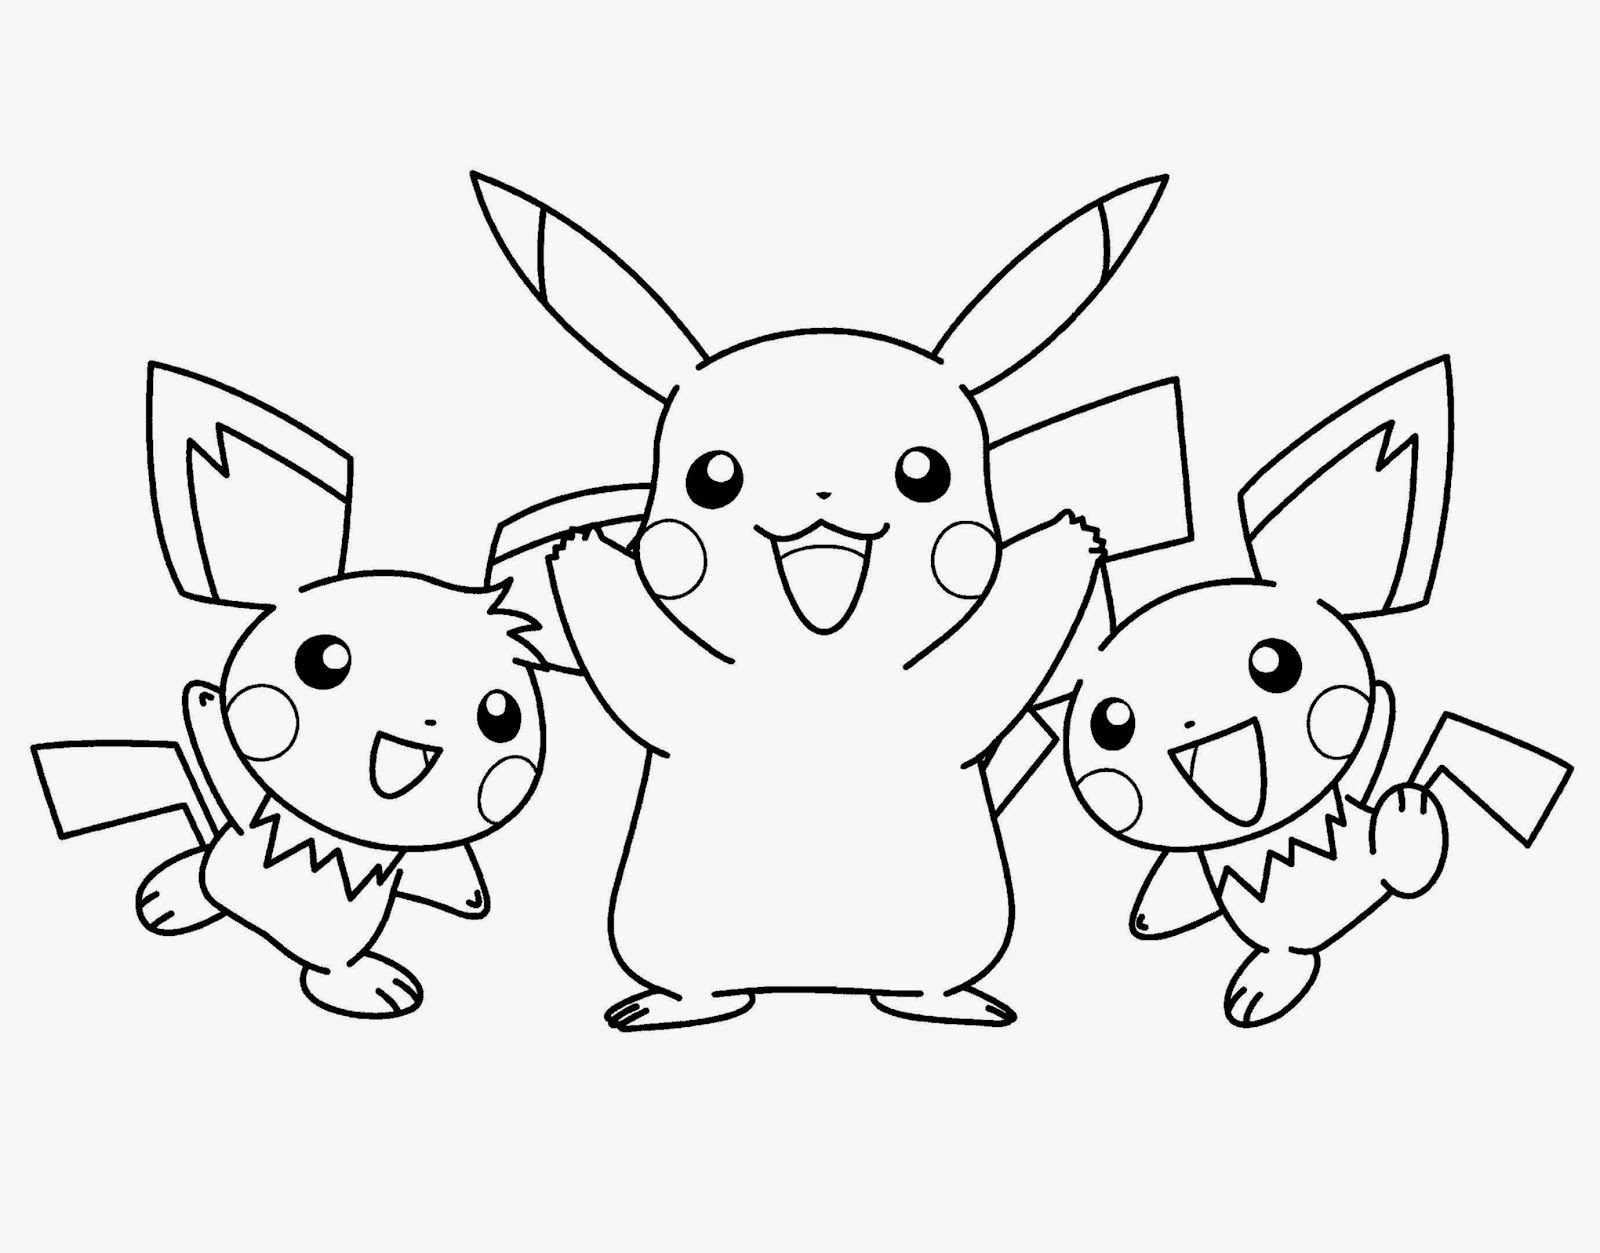 Tauros Pokemon Coloring Page